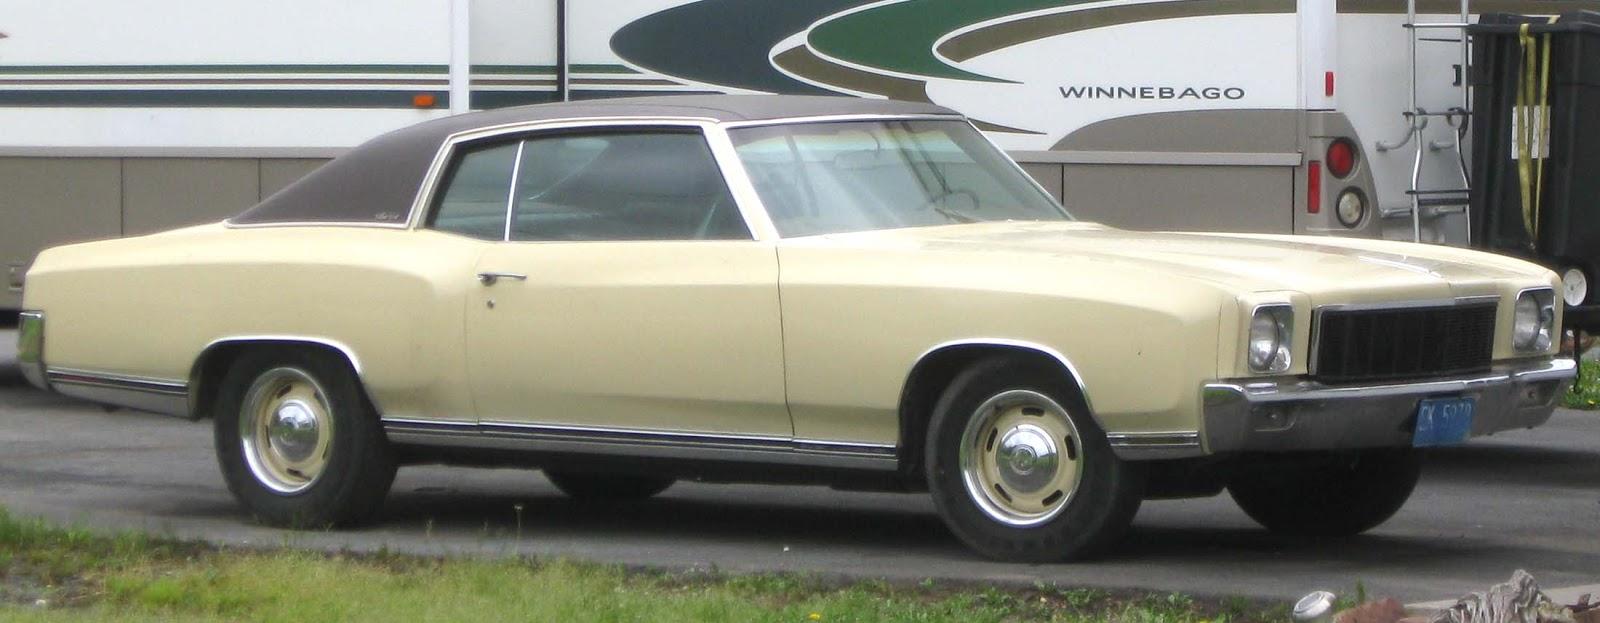 Seranitafari Street Team: Could GM Say Yes? The Chevrolet Monte ...